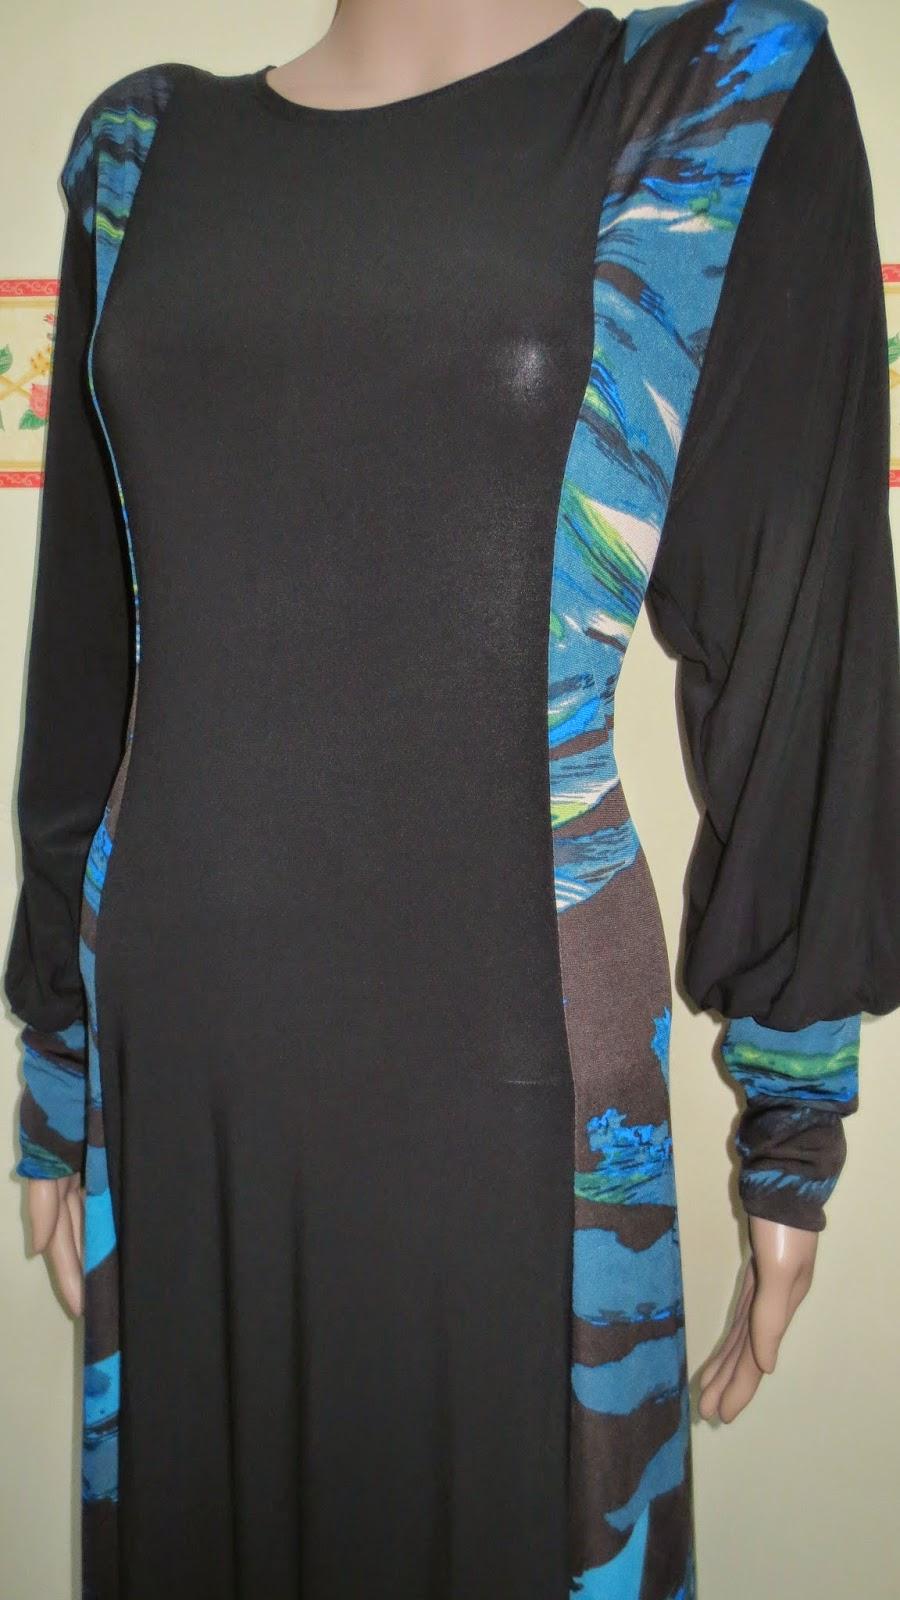 Princess collection baju jubah newhairstylesformen2014 com